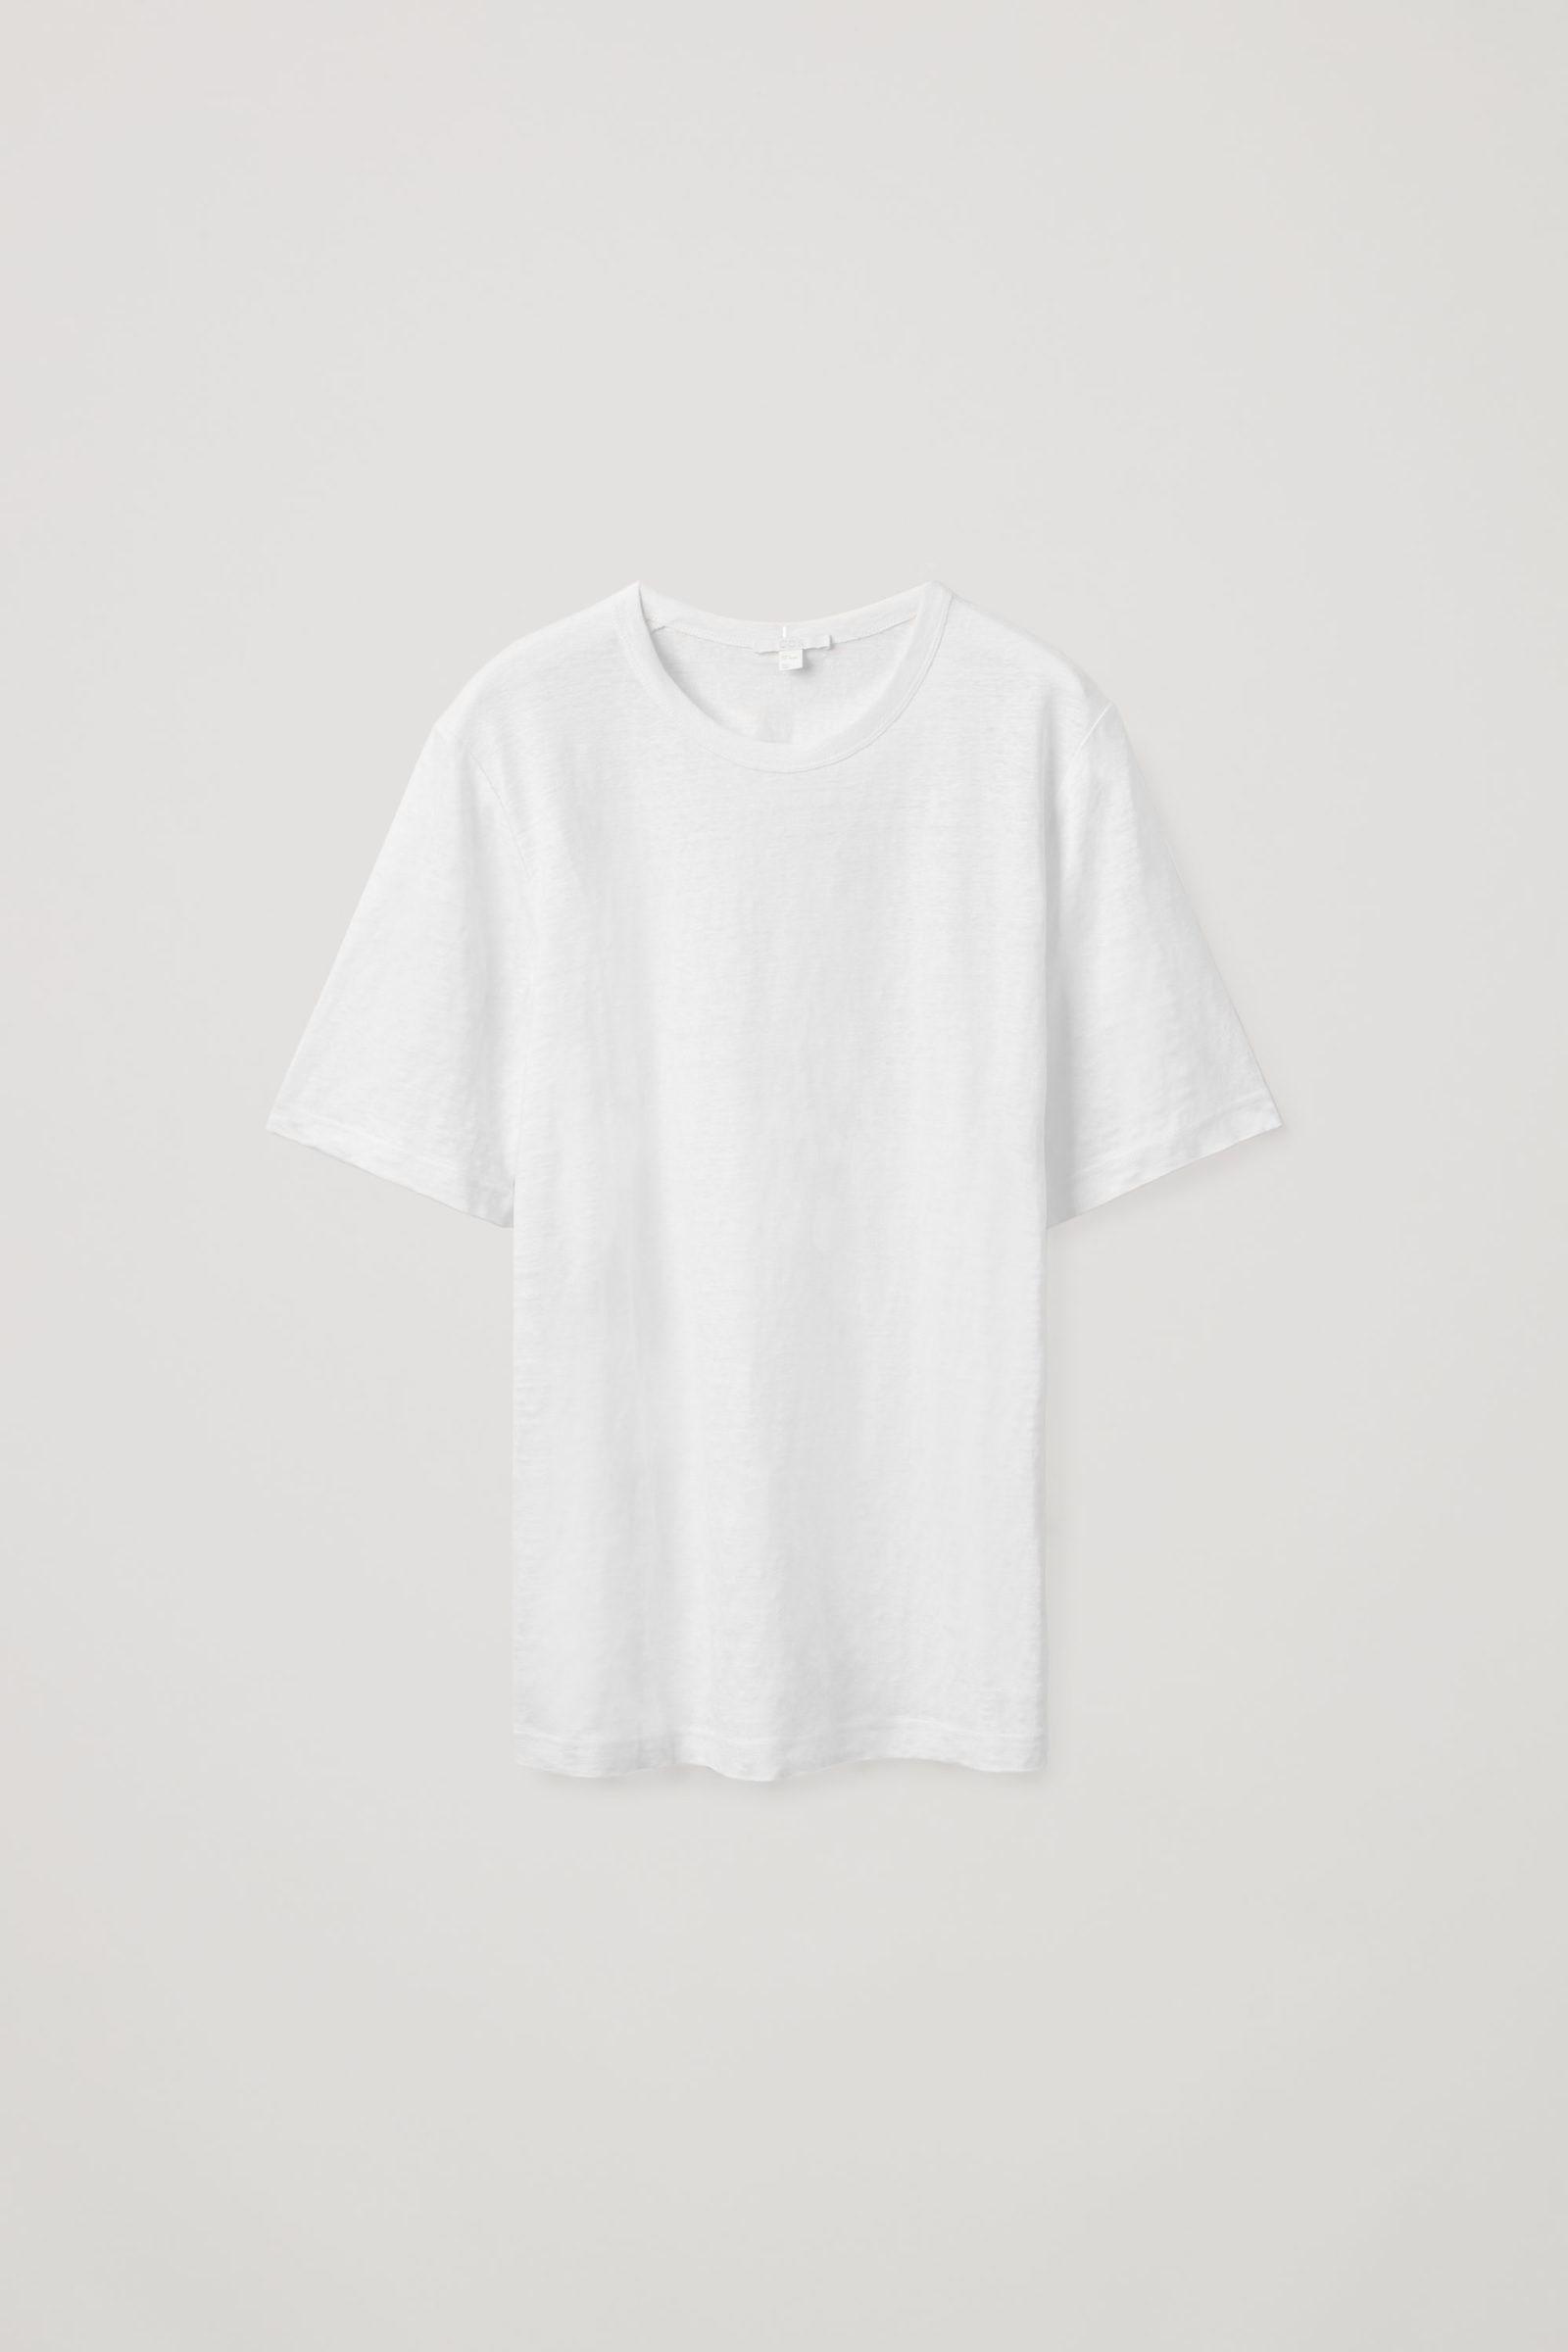 COS 롱라인 리넨 티셔츠의 화이트컬러 Product입니다.